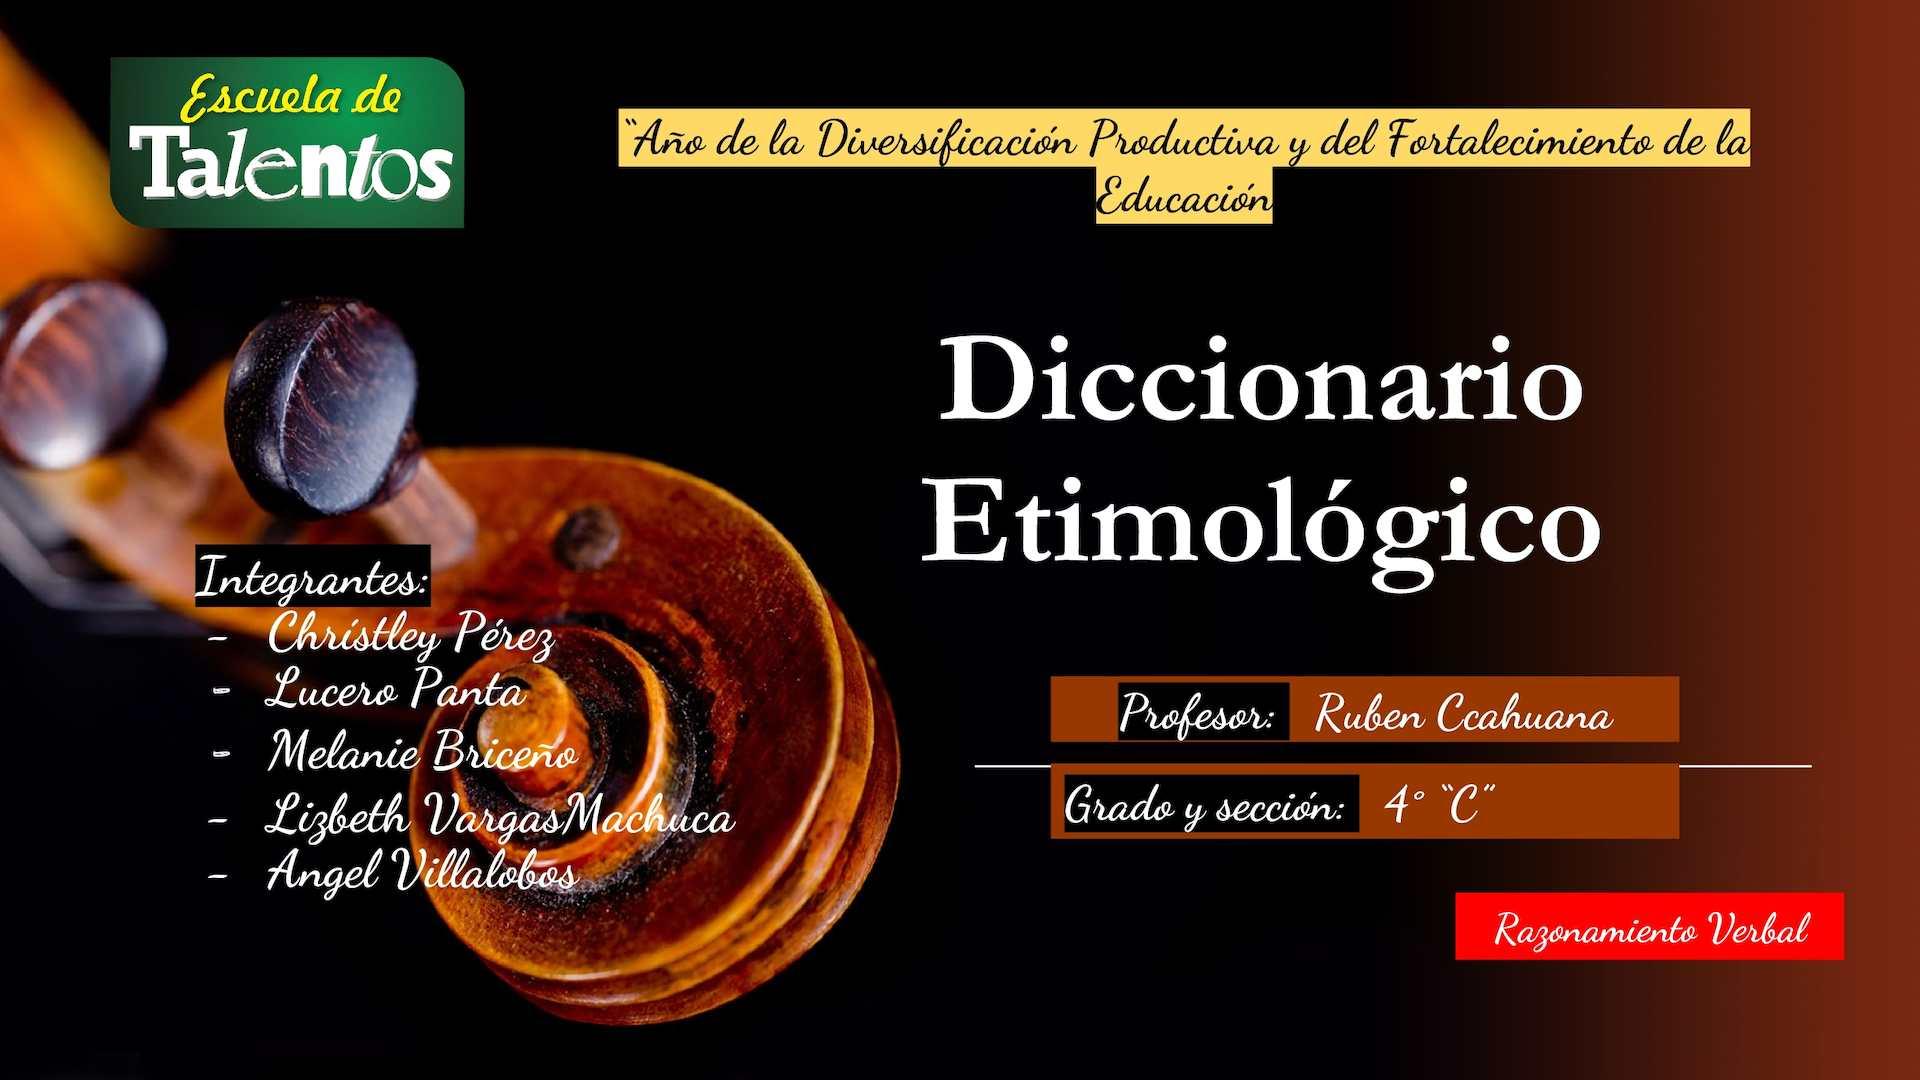 Heterosexual definicion etimologica